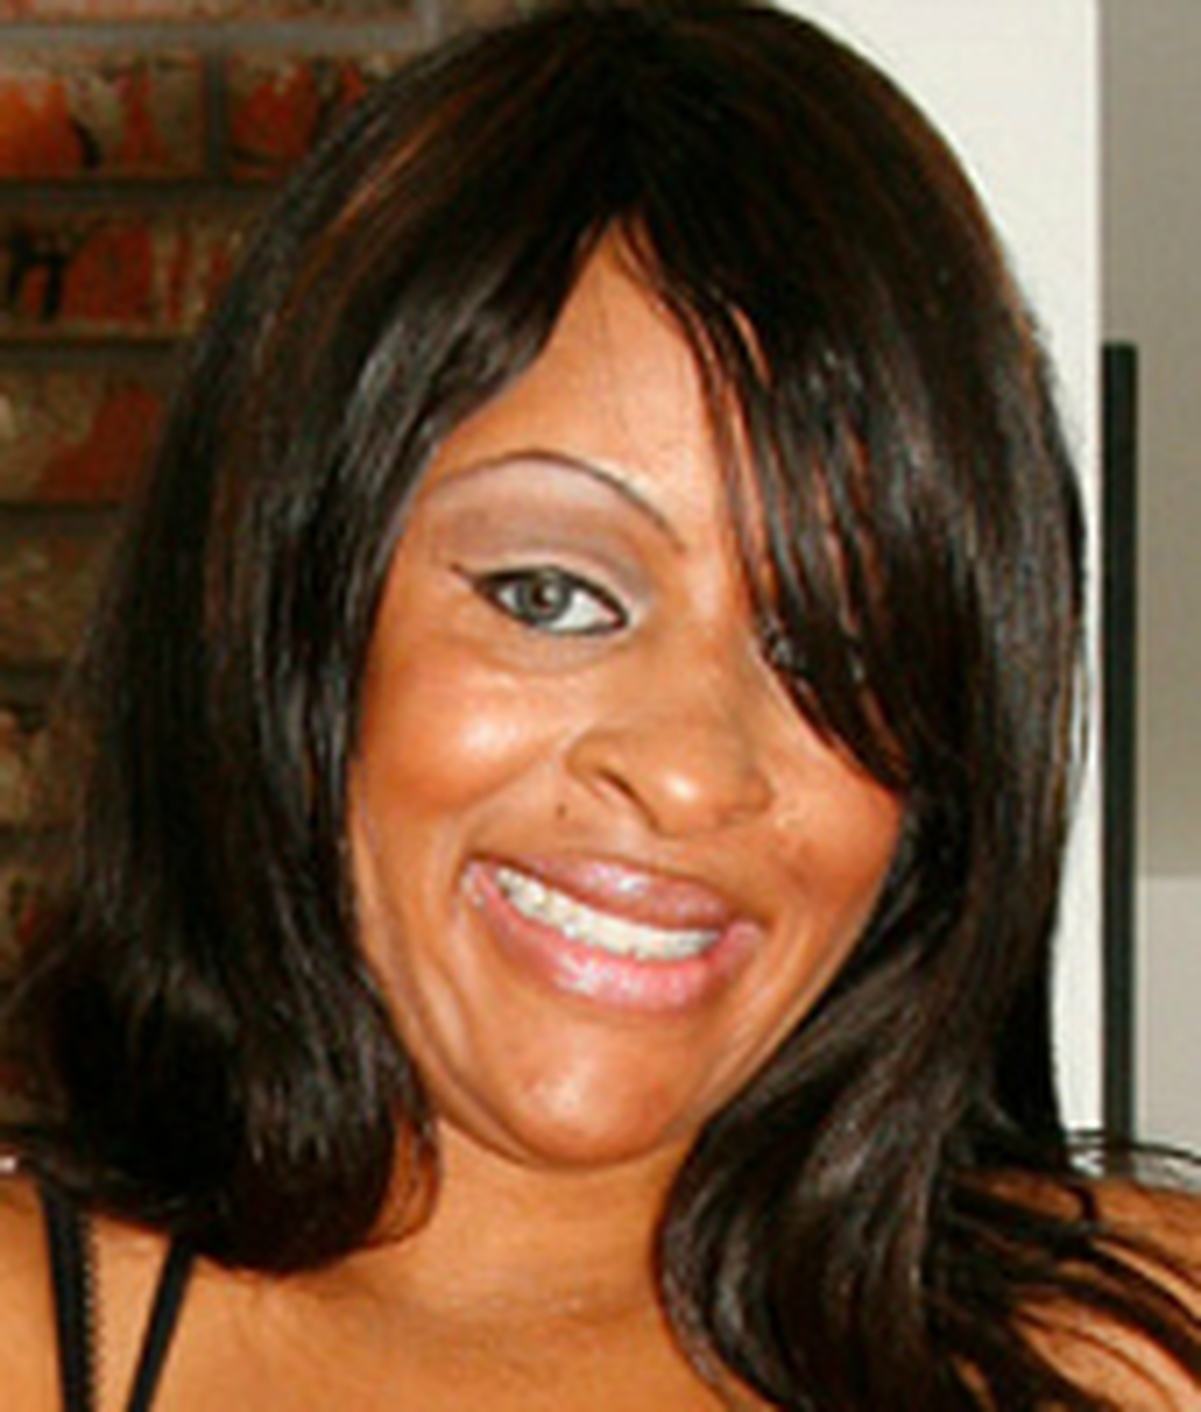 Stacy Stash